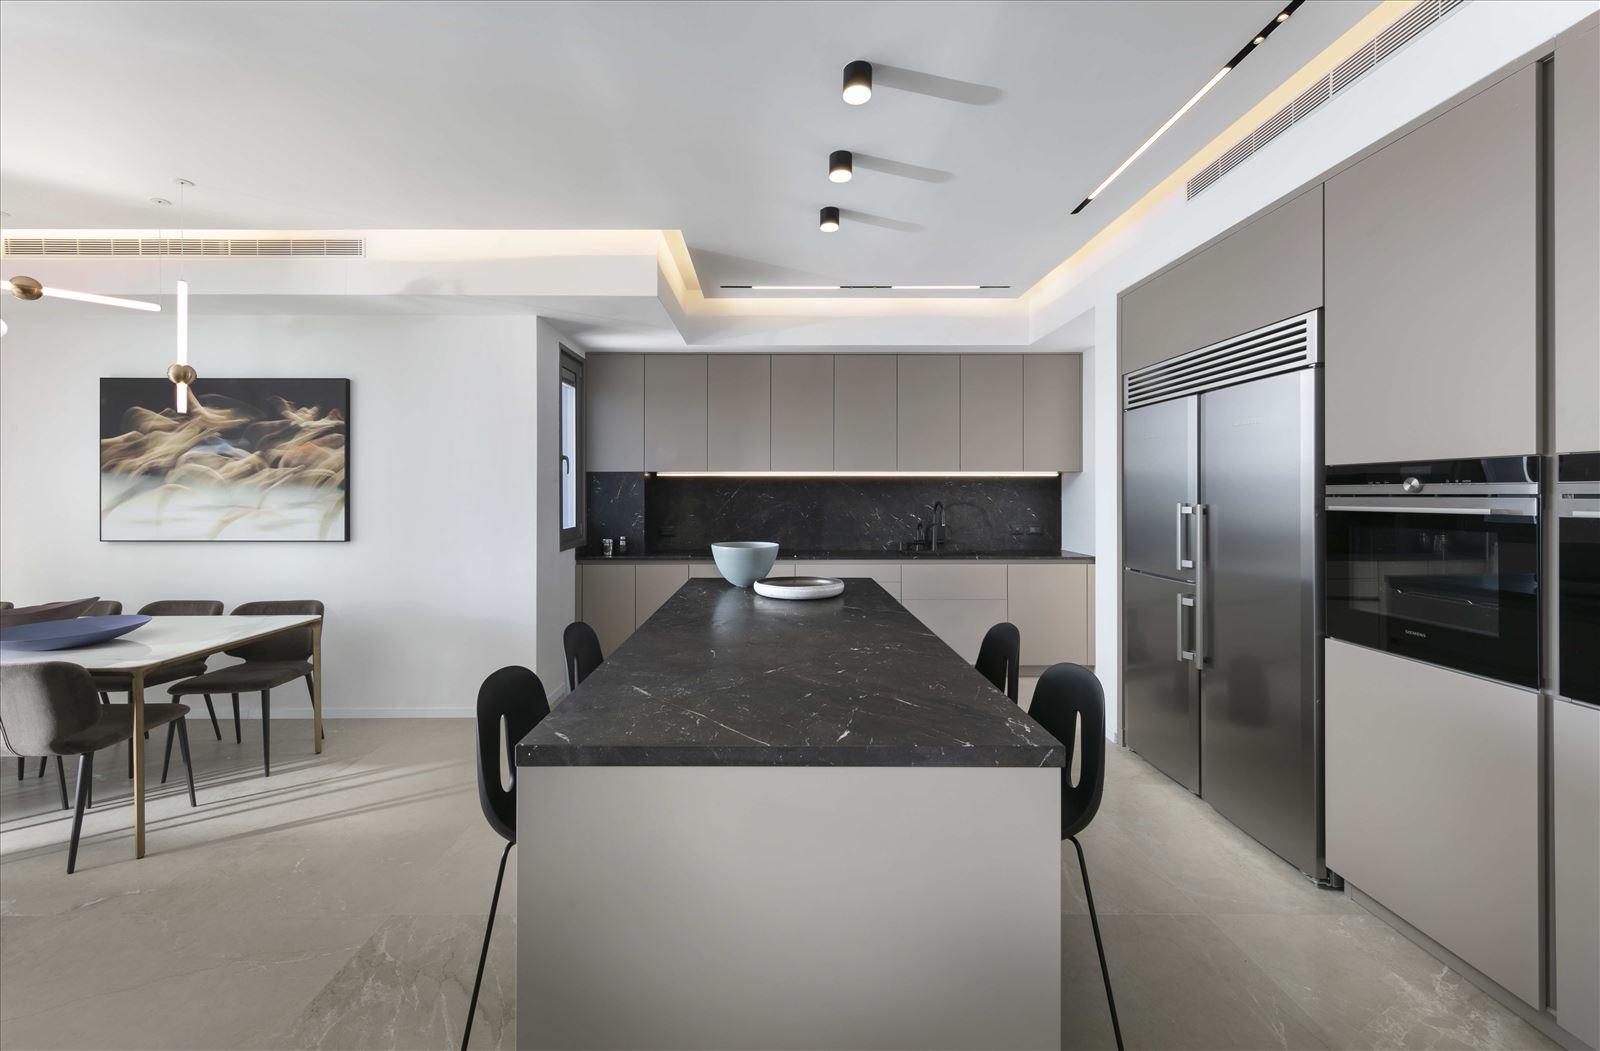 Private home - Herzliya תאורת מטבח נעשתה על ידי דורי קמחי